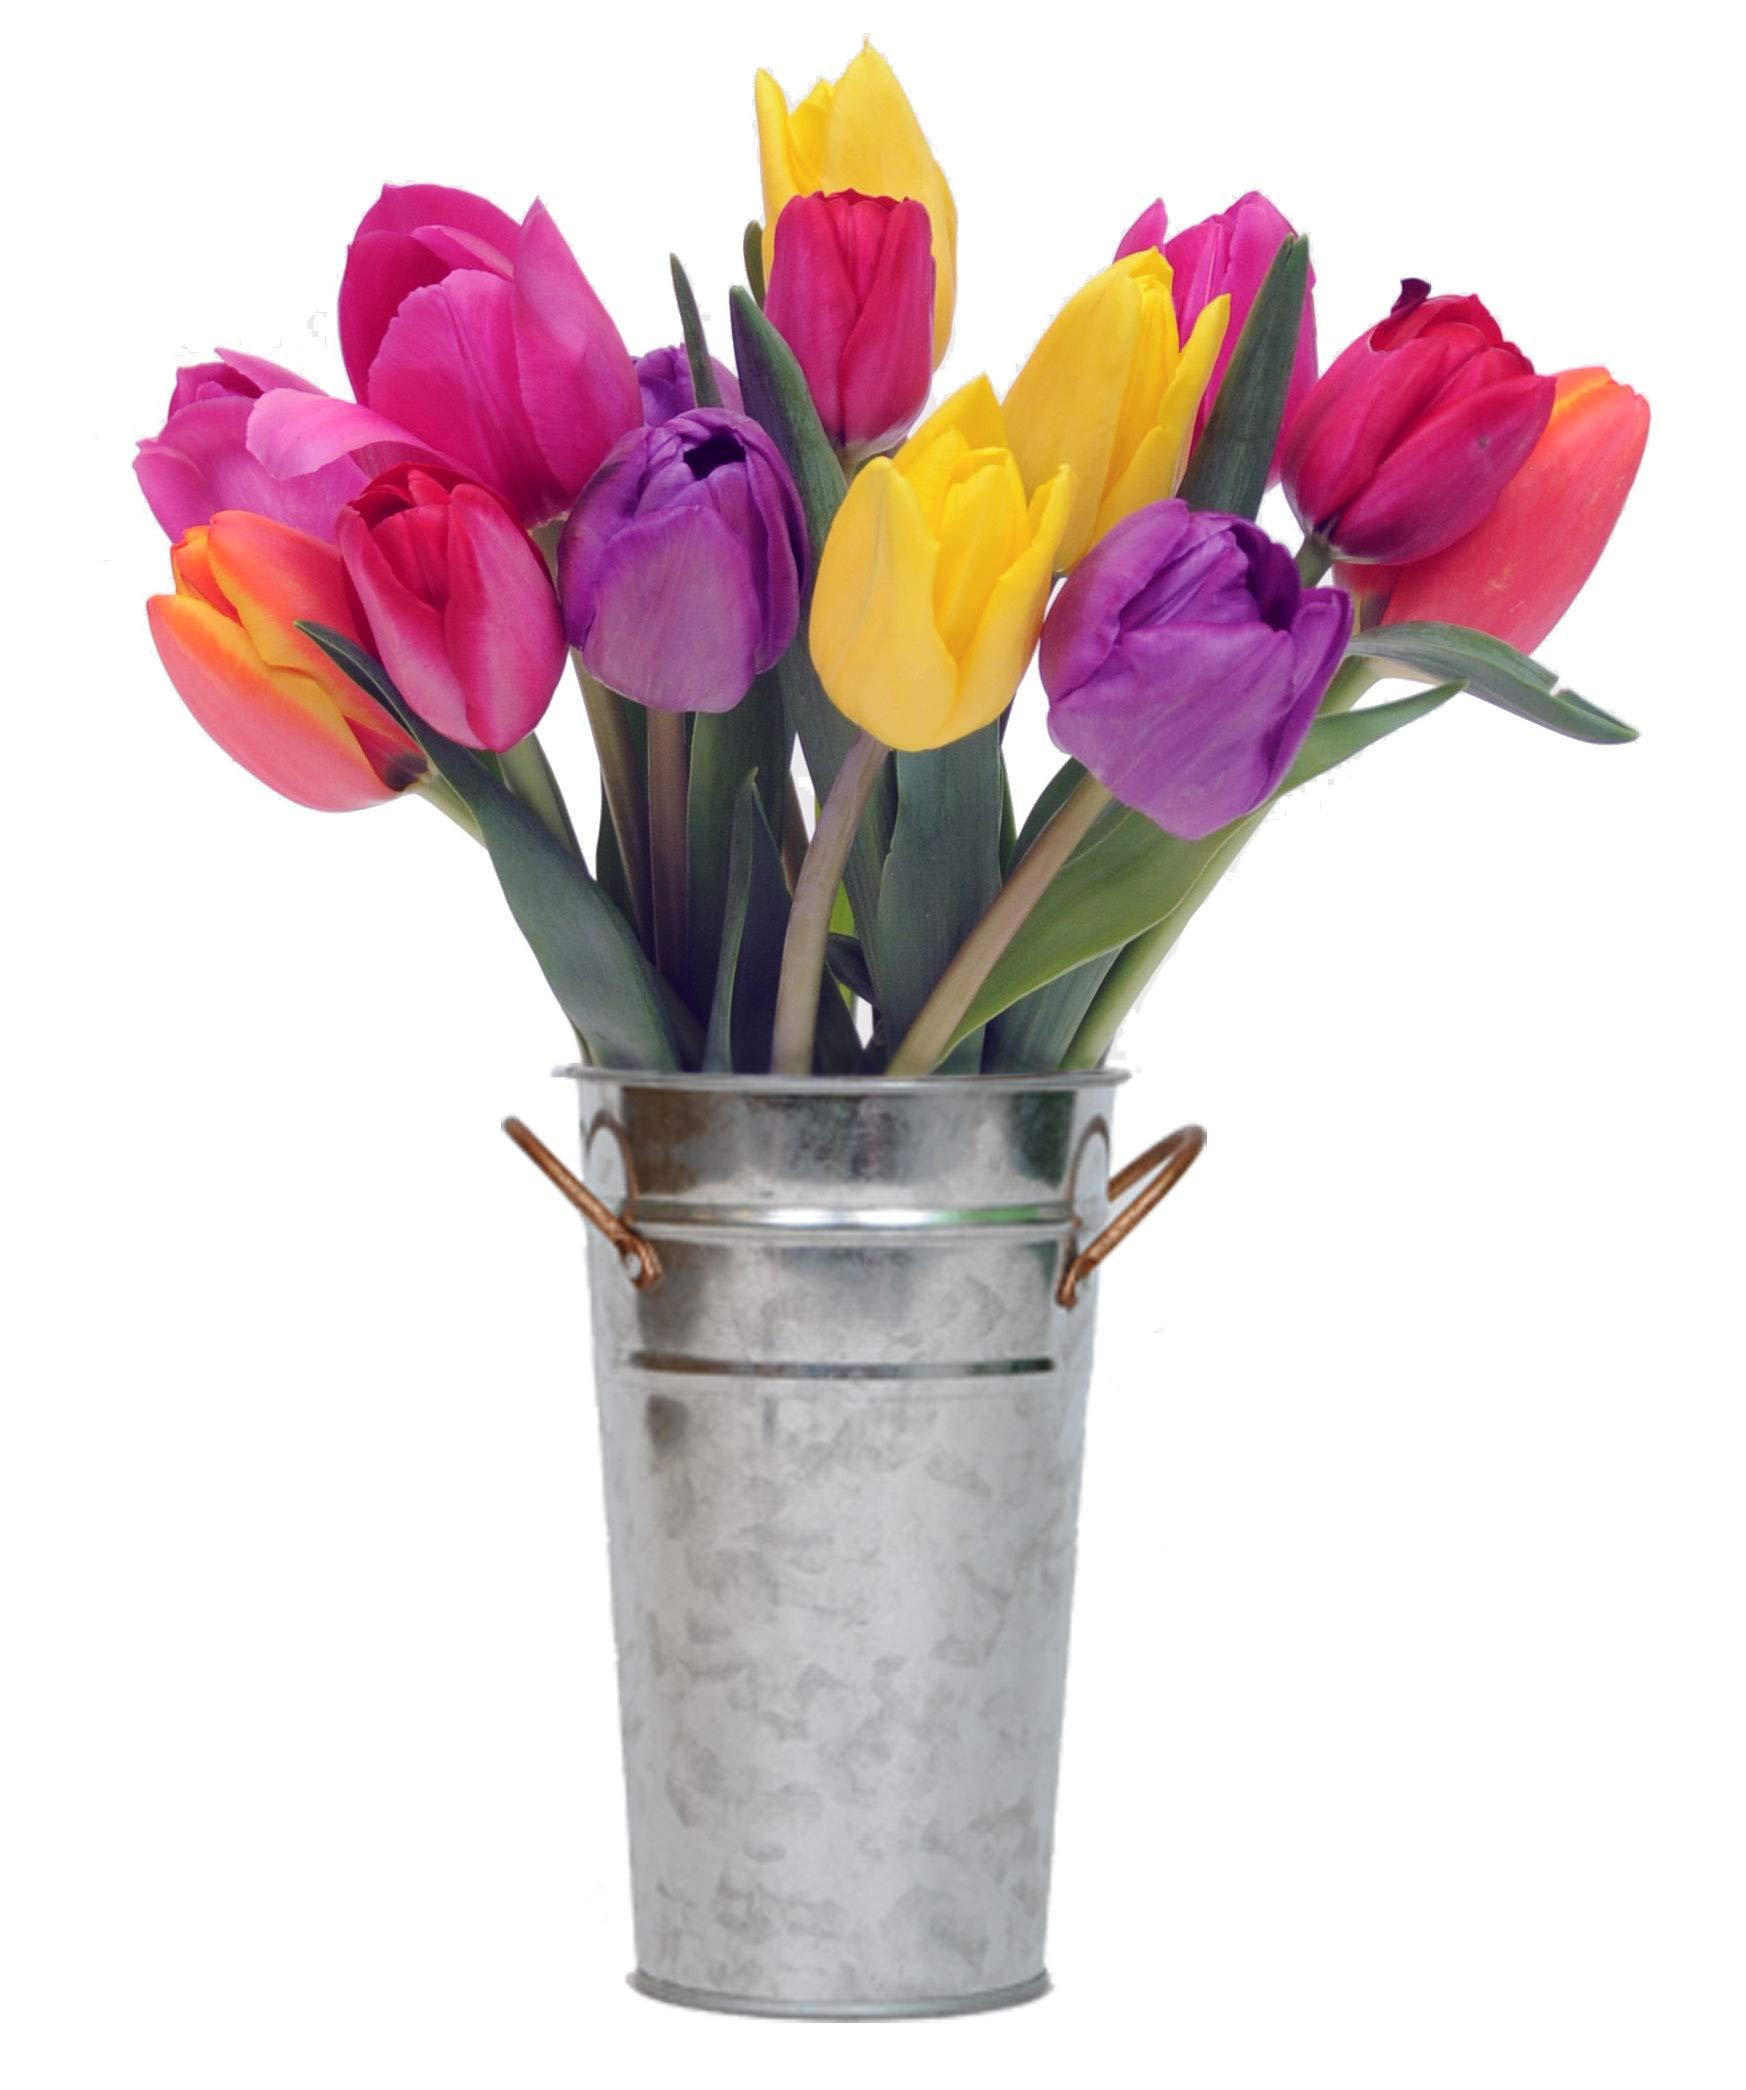 Stargazer Barn - Happy Bouquet - 15 Stems Fresh Tulips with Vase - Farm Direct